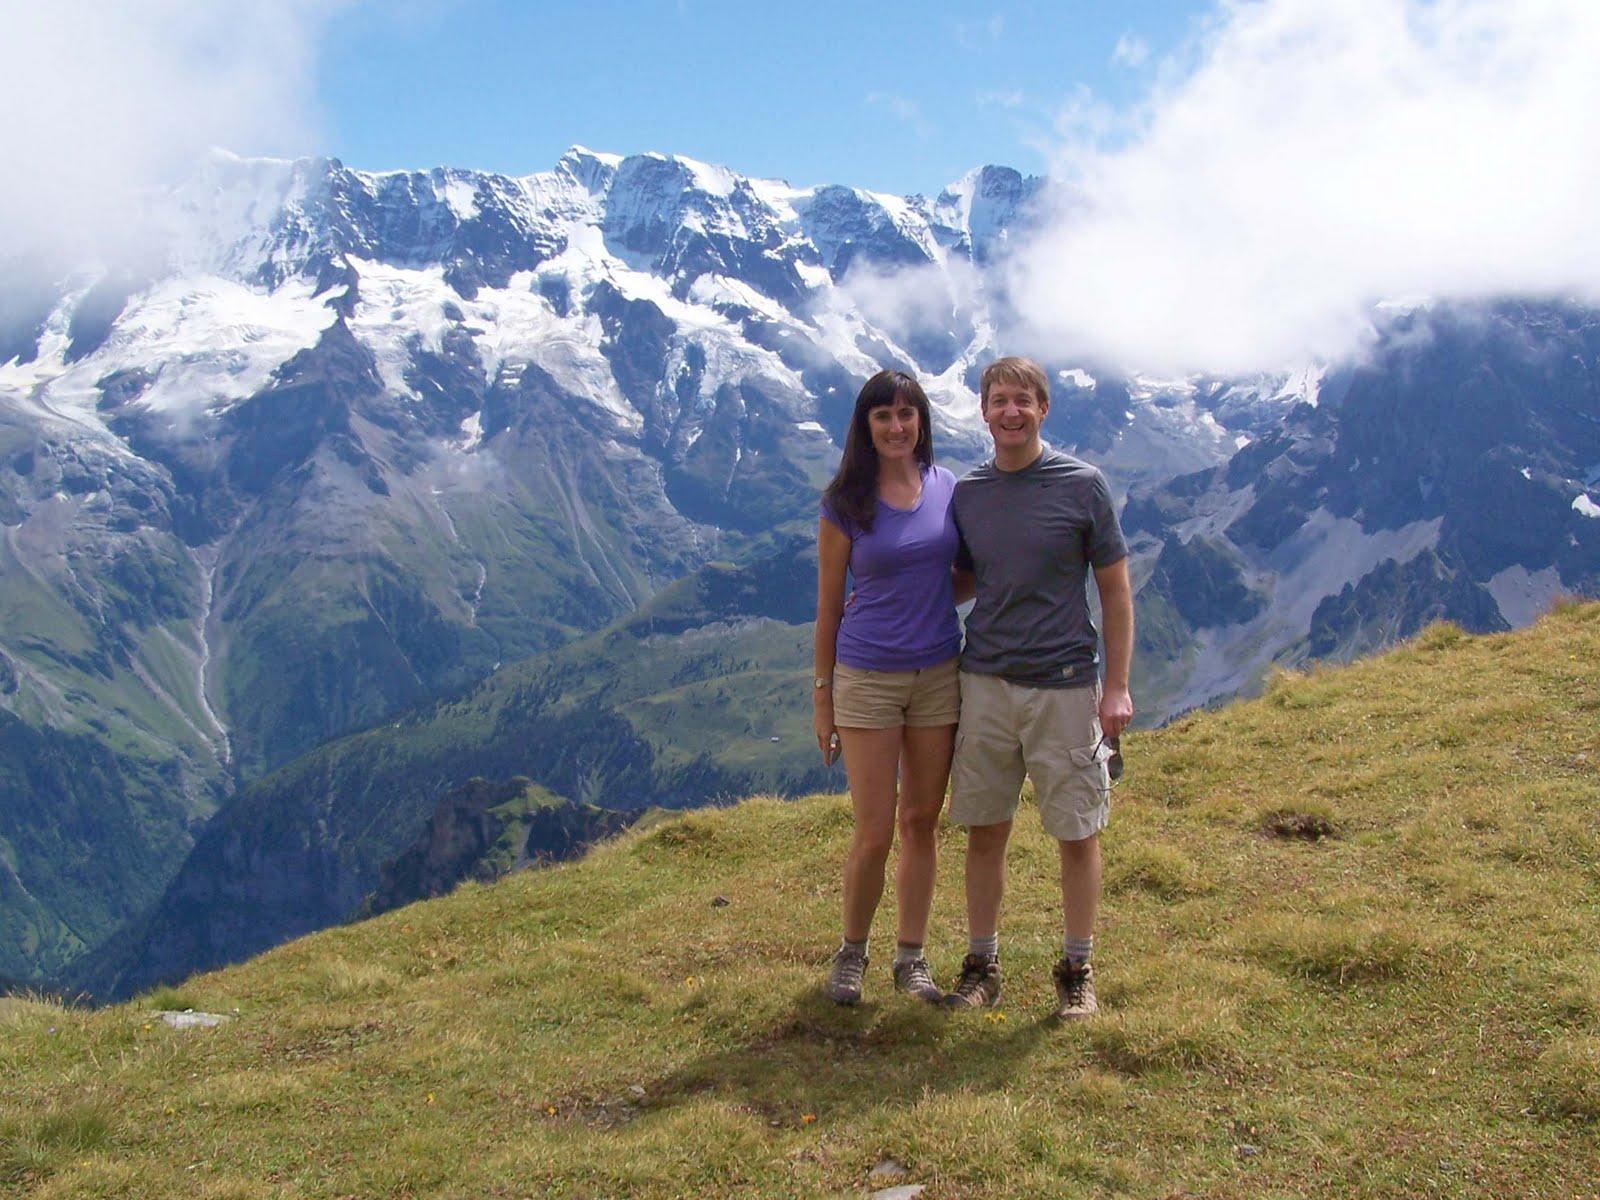 Switzerland Vacation Pictures